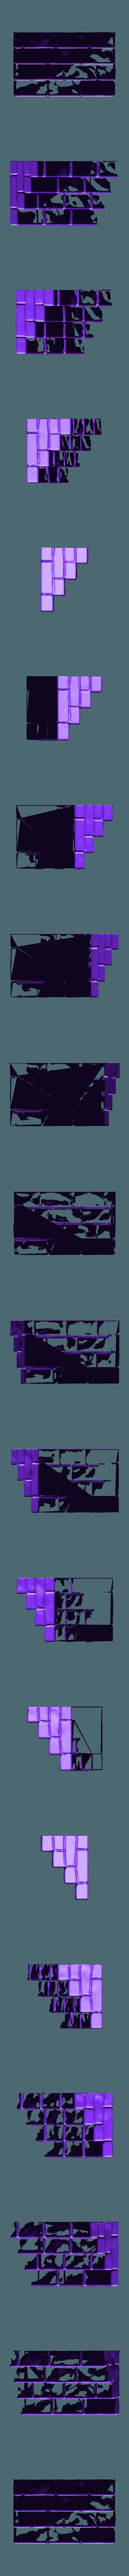 stairs1.stl Download free STL file Fantasy city set • 3D printable model, HeribertoValle